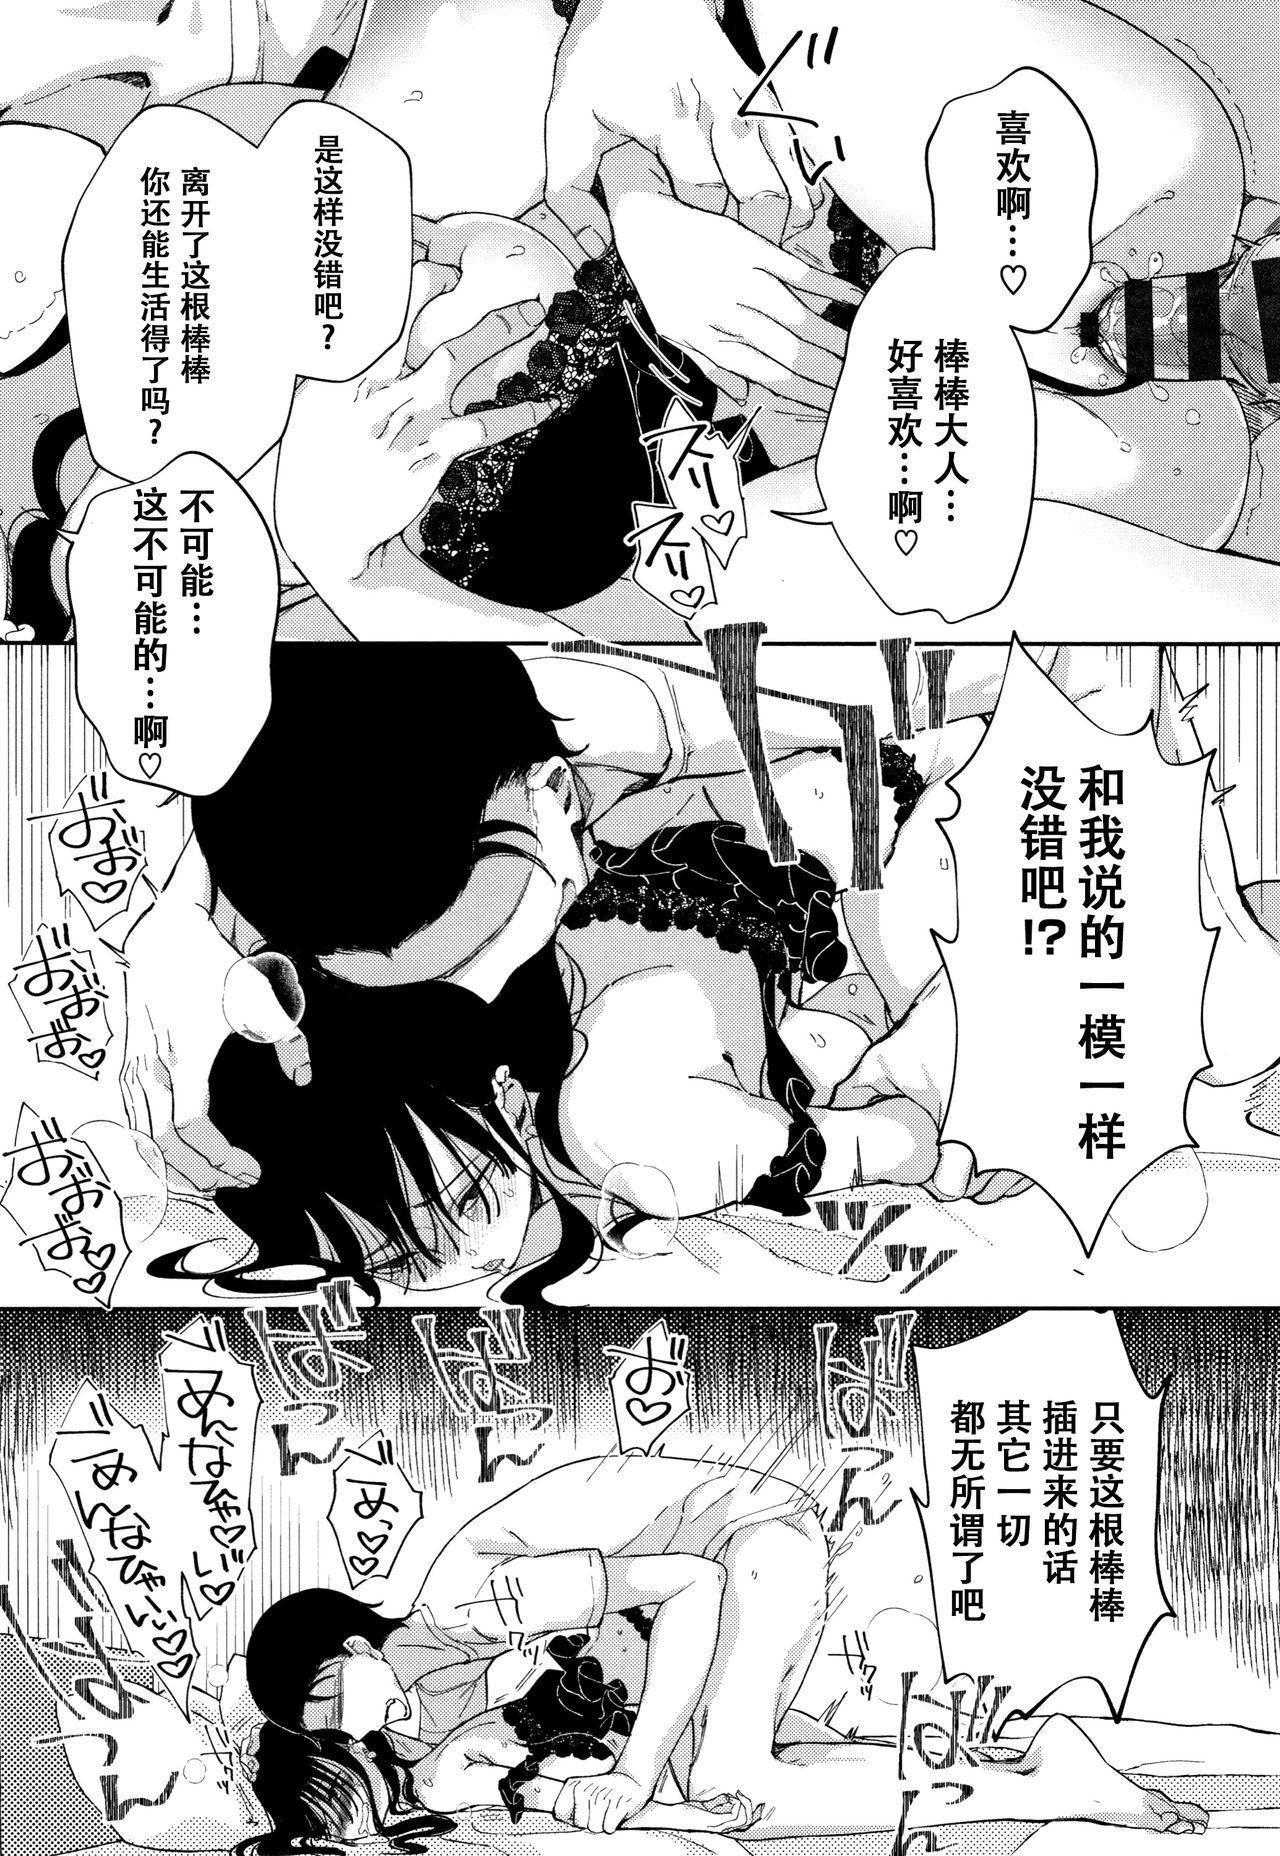 [Achumuchi] Saijaku Gal wa Ikizurai! - The weakest pussy is hard to go.ch.1-8 [Chinese] [战栗的玻璃棒汉化] [Ongoing] 89